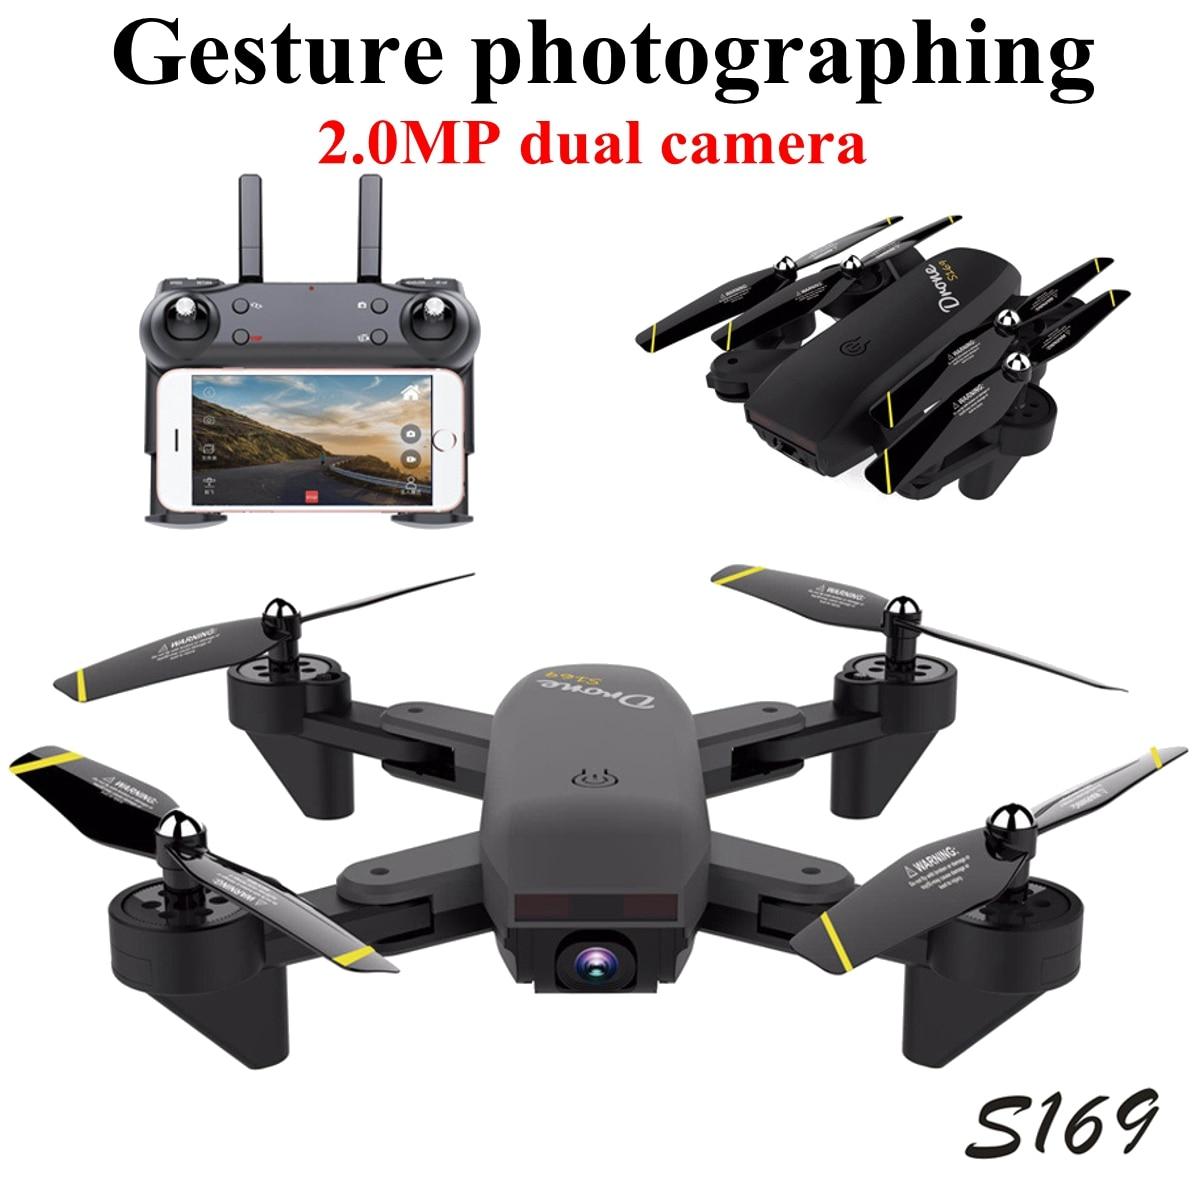 купить Folding drone Wifi FPV 2MP 120 Degree Wide Angle Dual Camera Drone Remote Control RC Quadcopter по цене 3408.9 рублей